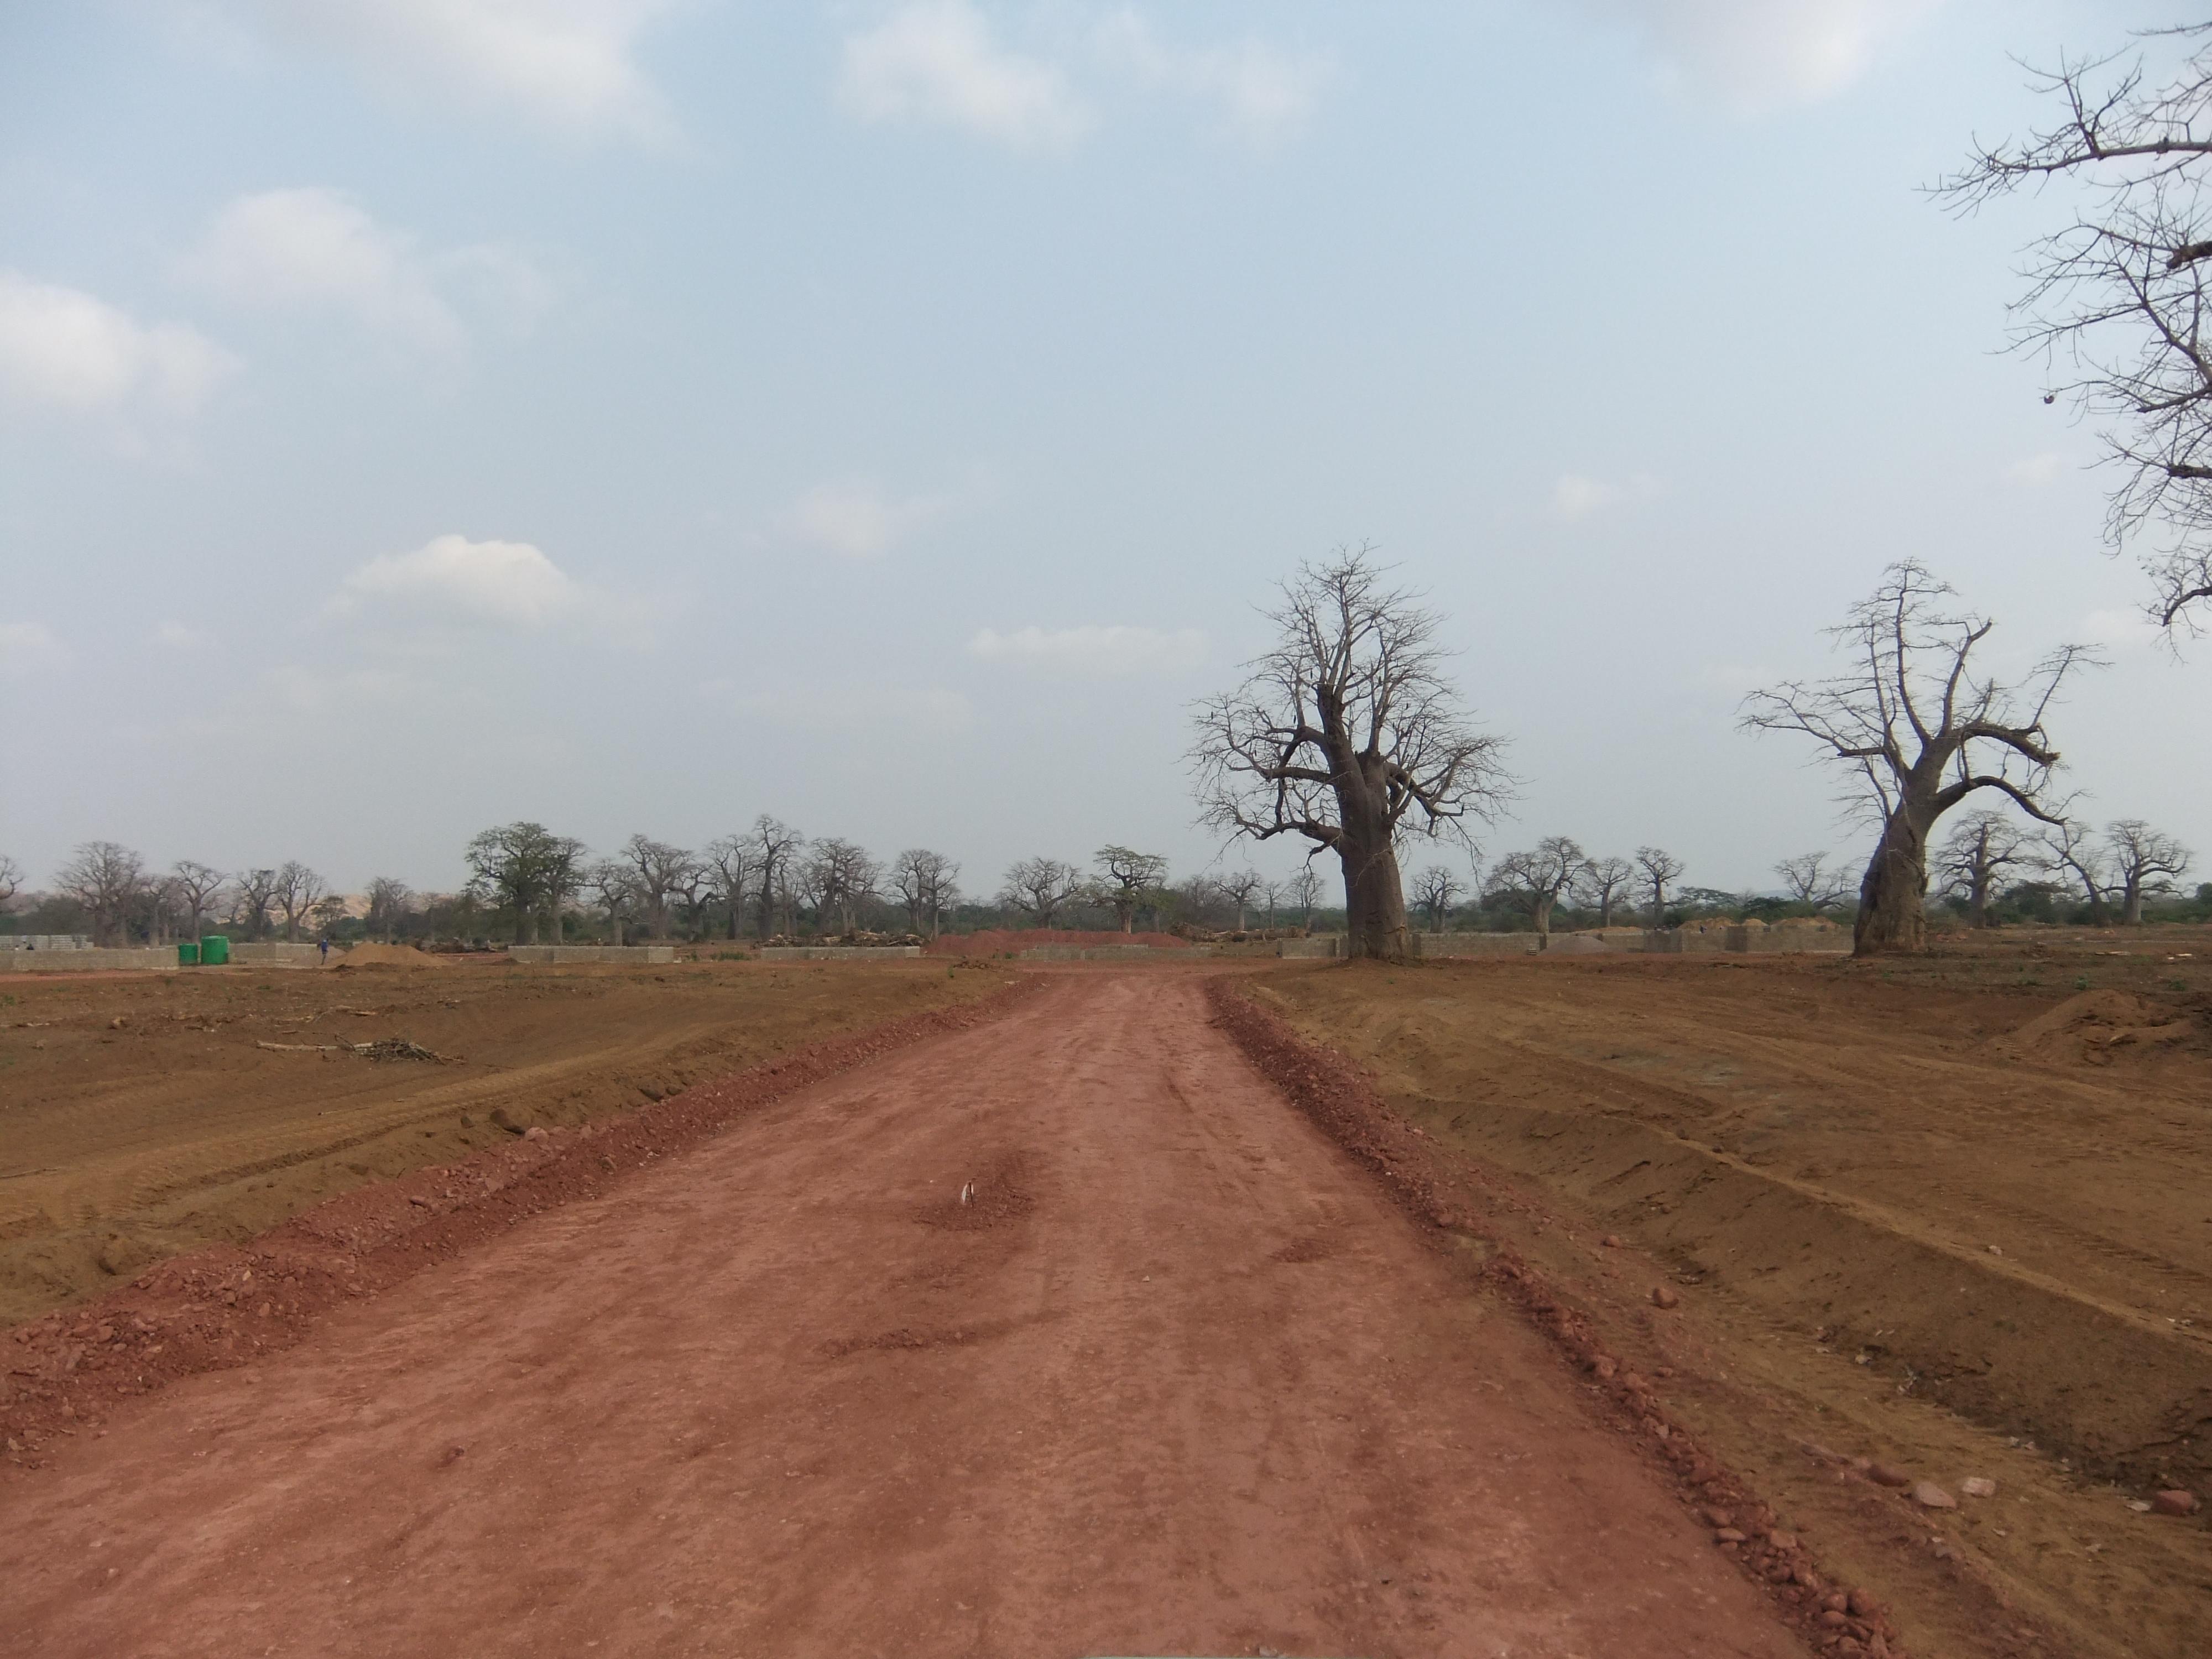 Cambambe, Angola